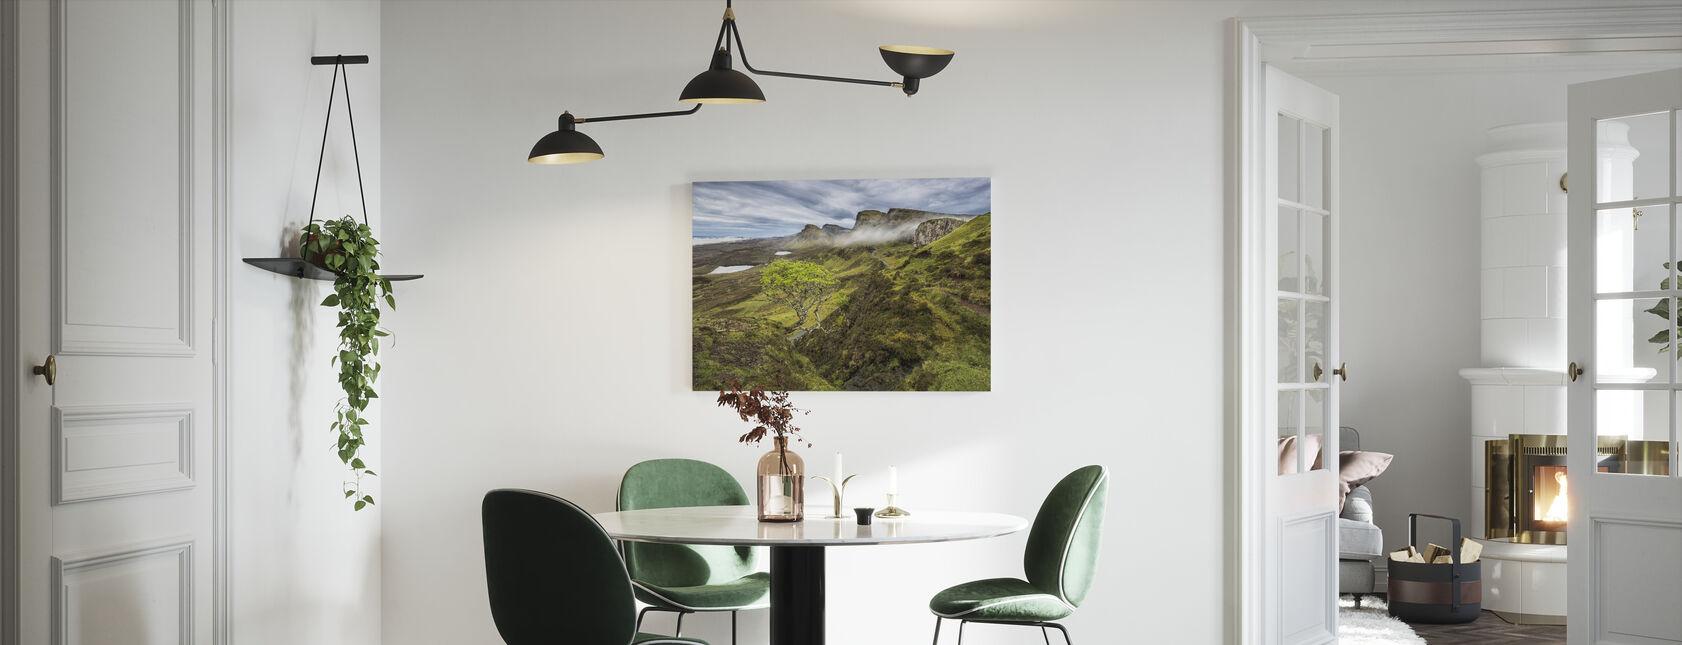 Quirang, Isle of Skye - Skottland - Canvastavla - Kök